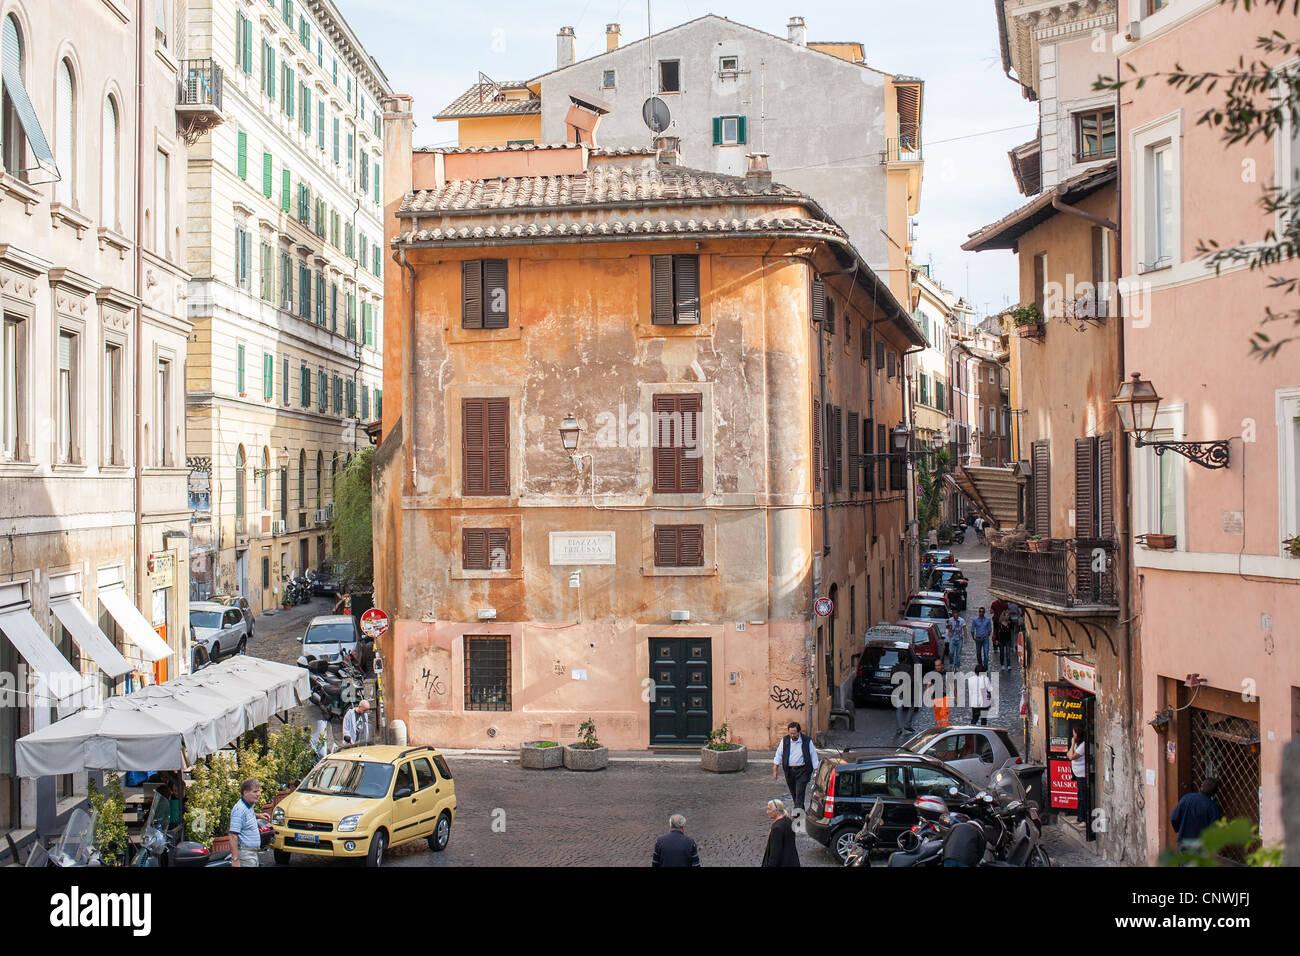 Piazza trilussa, Trastevere, Rome, Italy, Europe - Stock Image